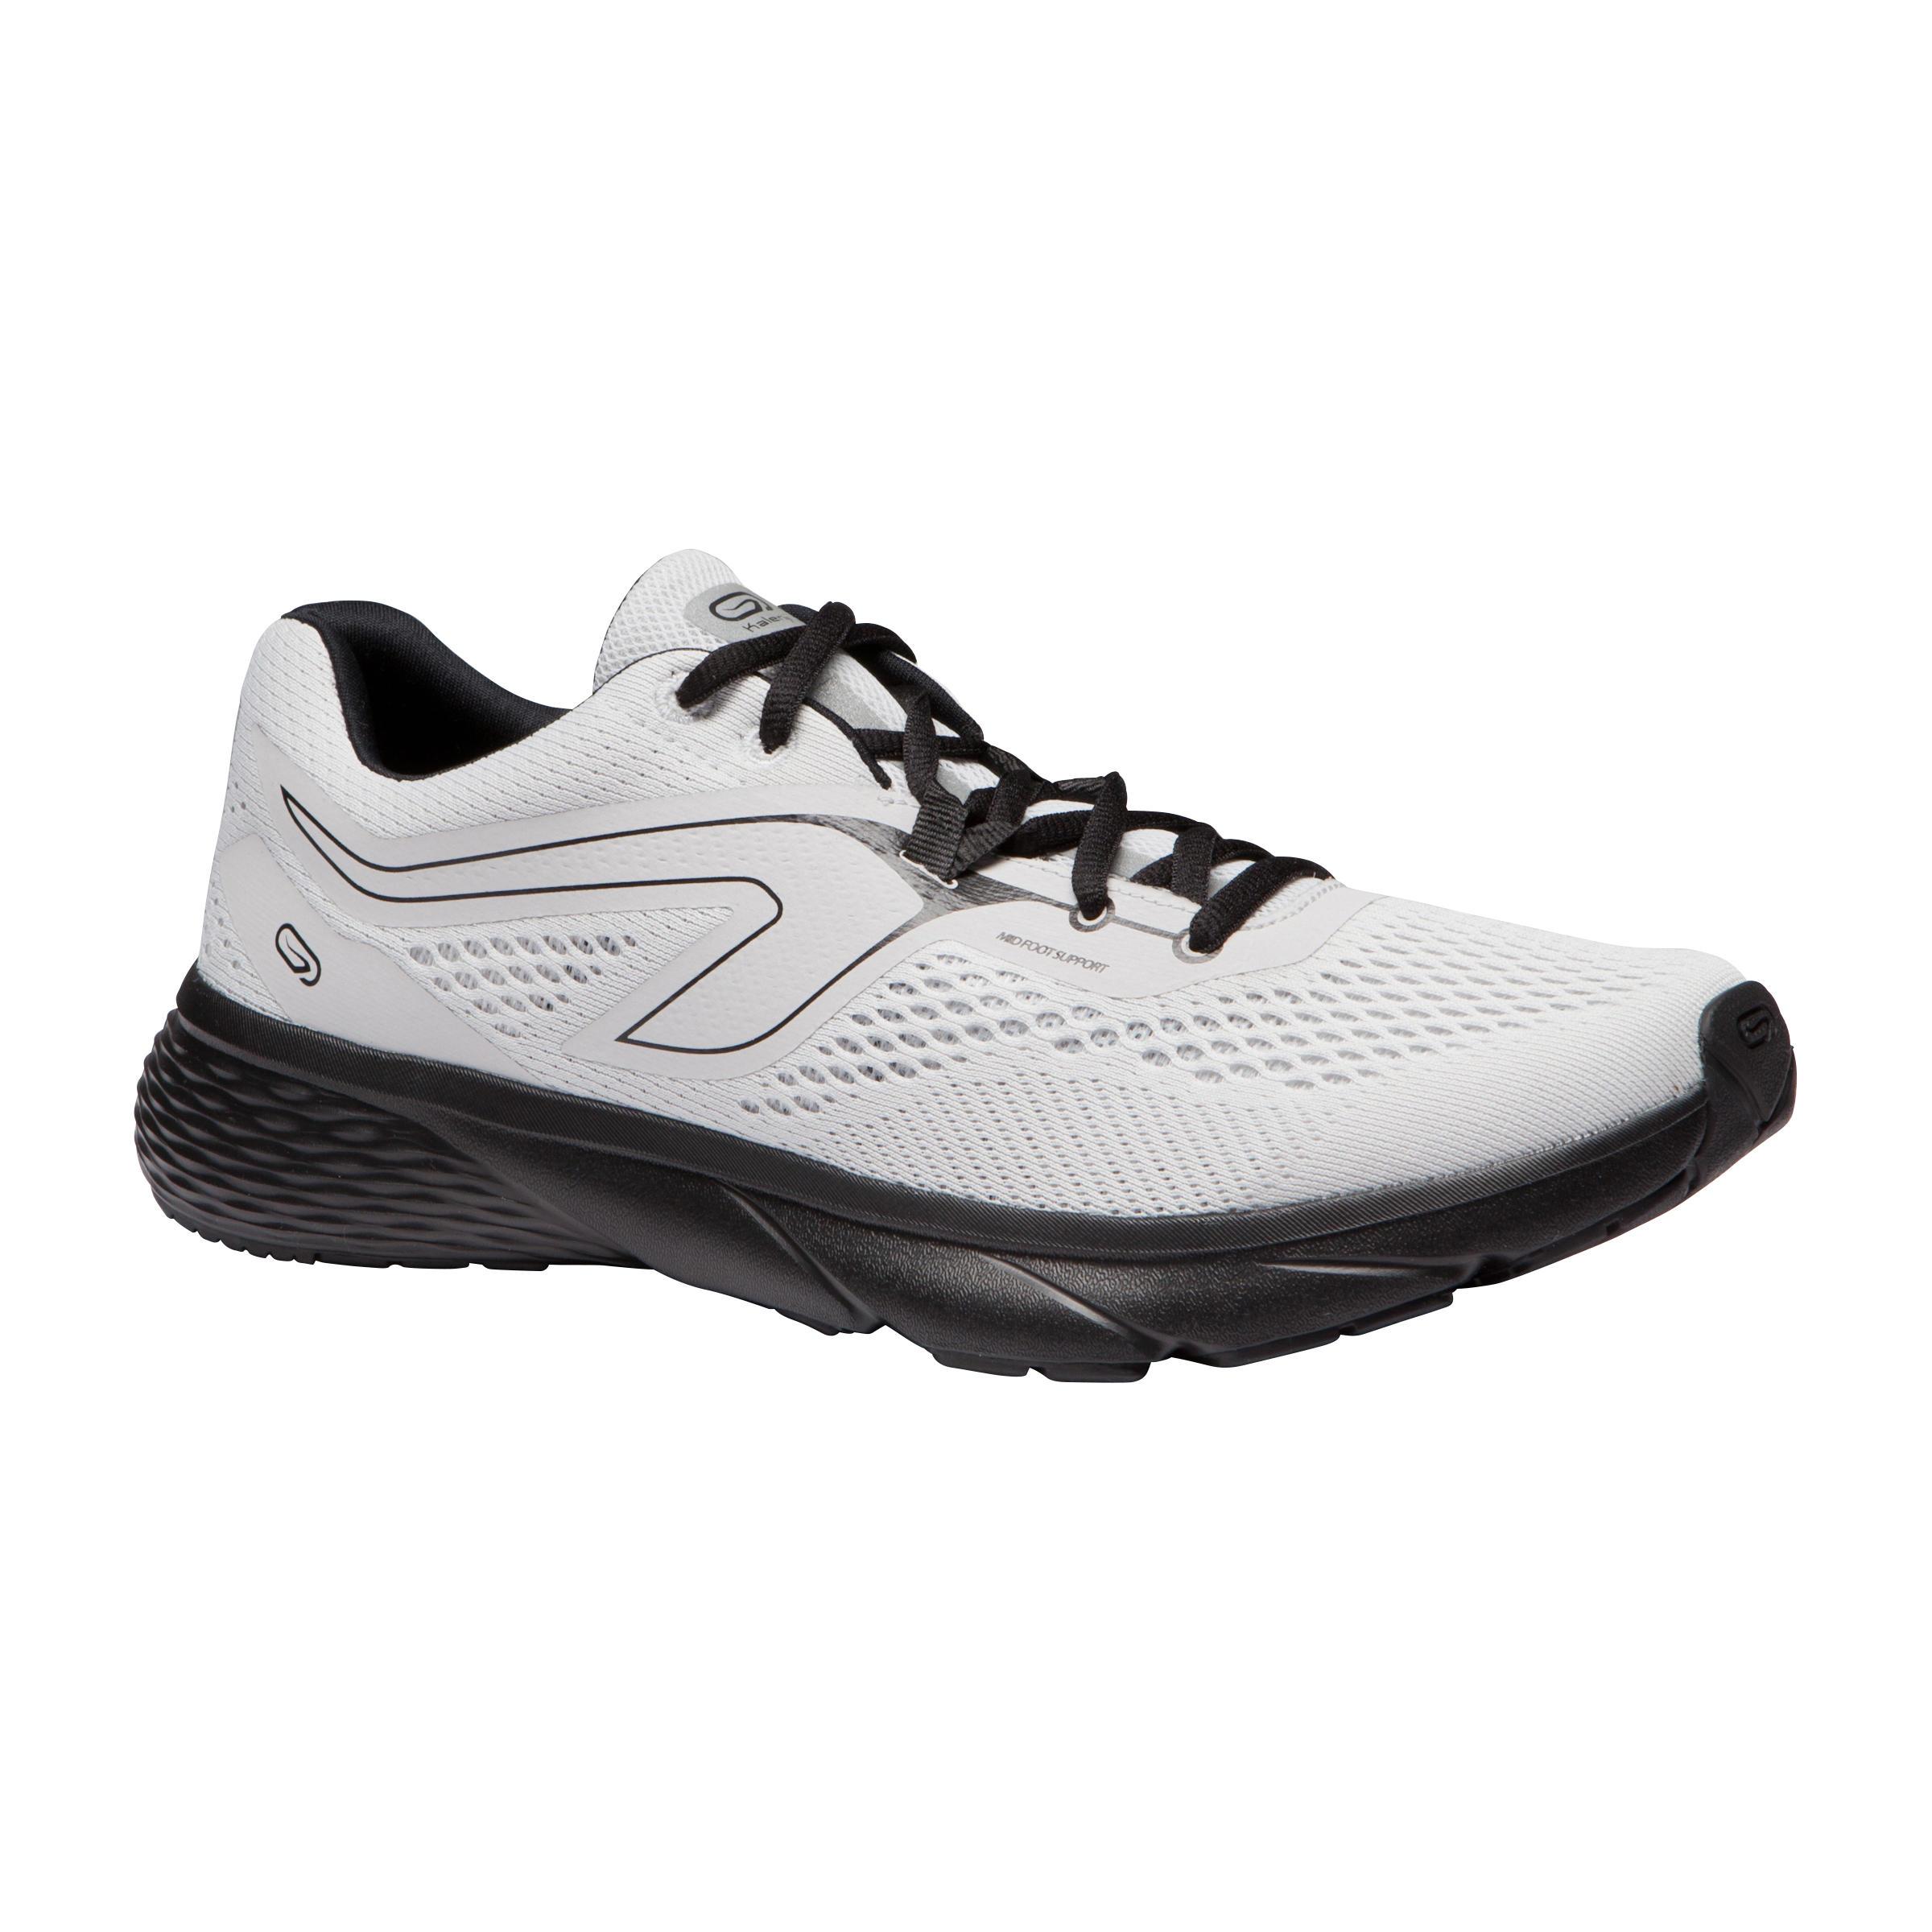 b73d185d3 Comprar zapatillas de running para correr hombre